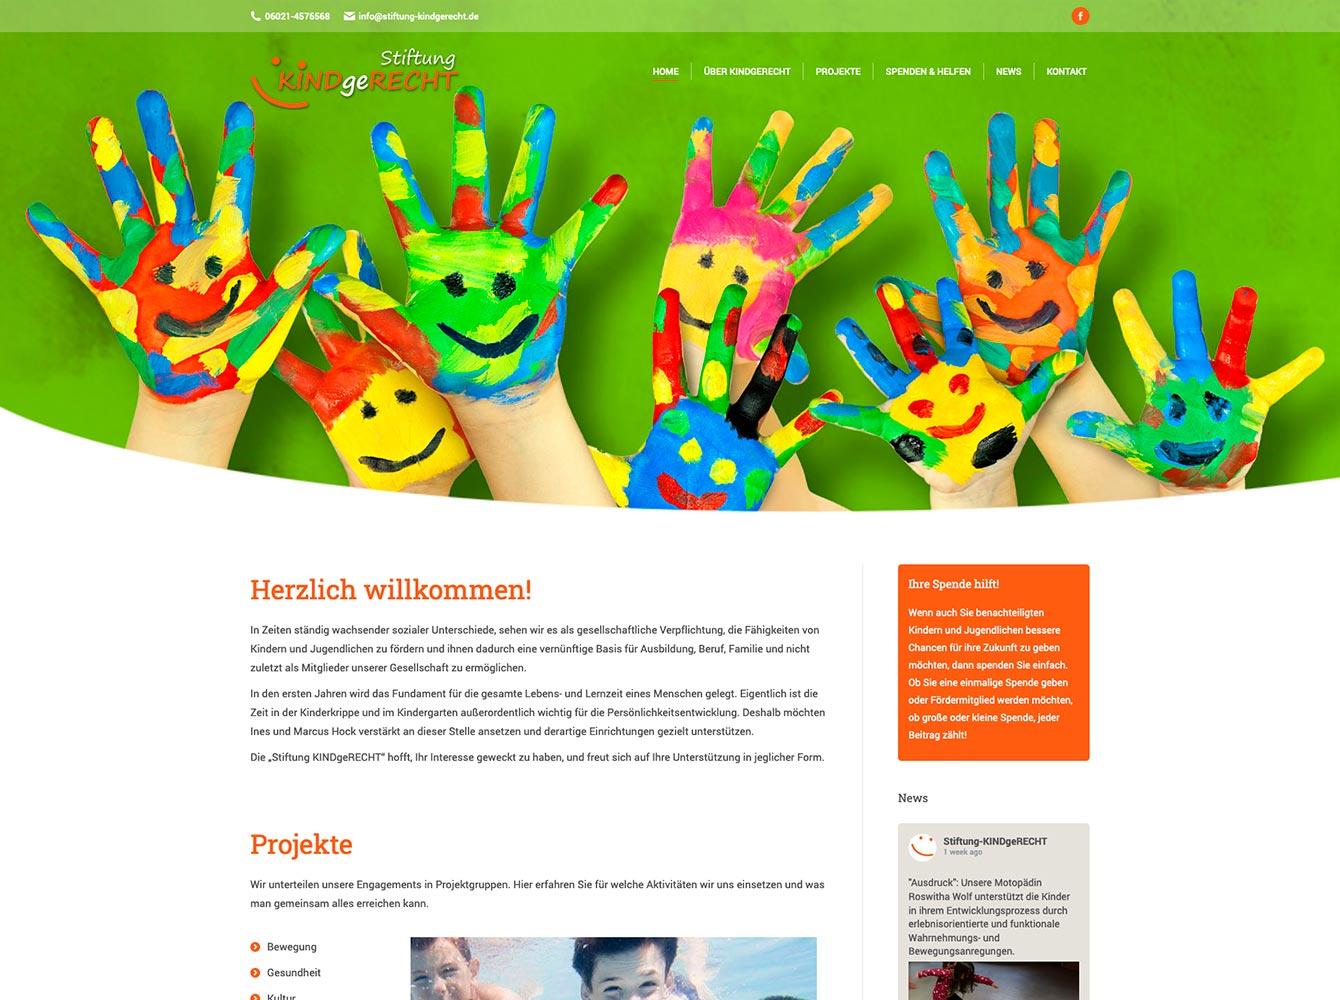 Webseite - Stiftung KINDgeRECHT